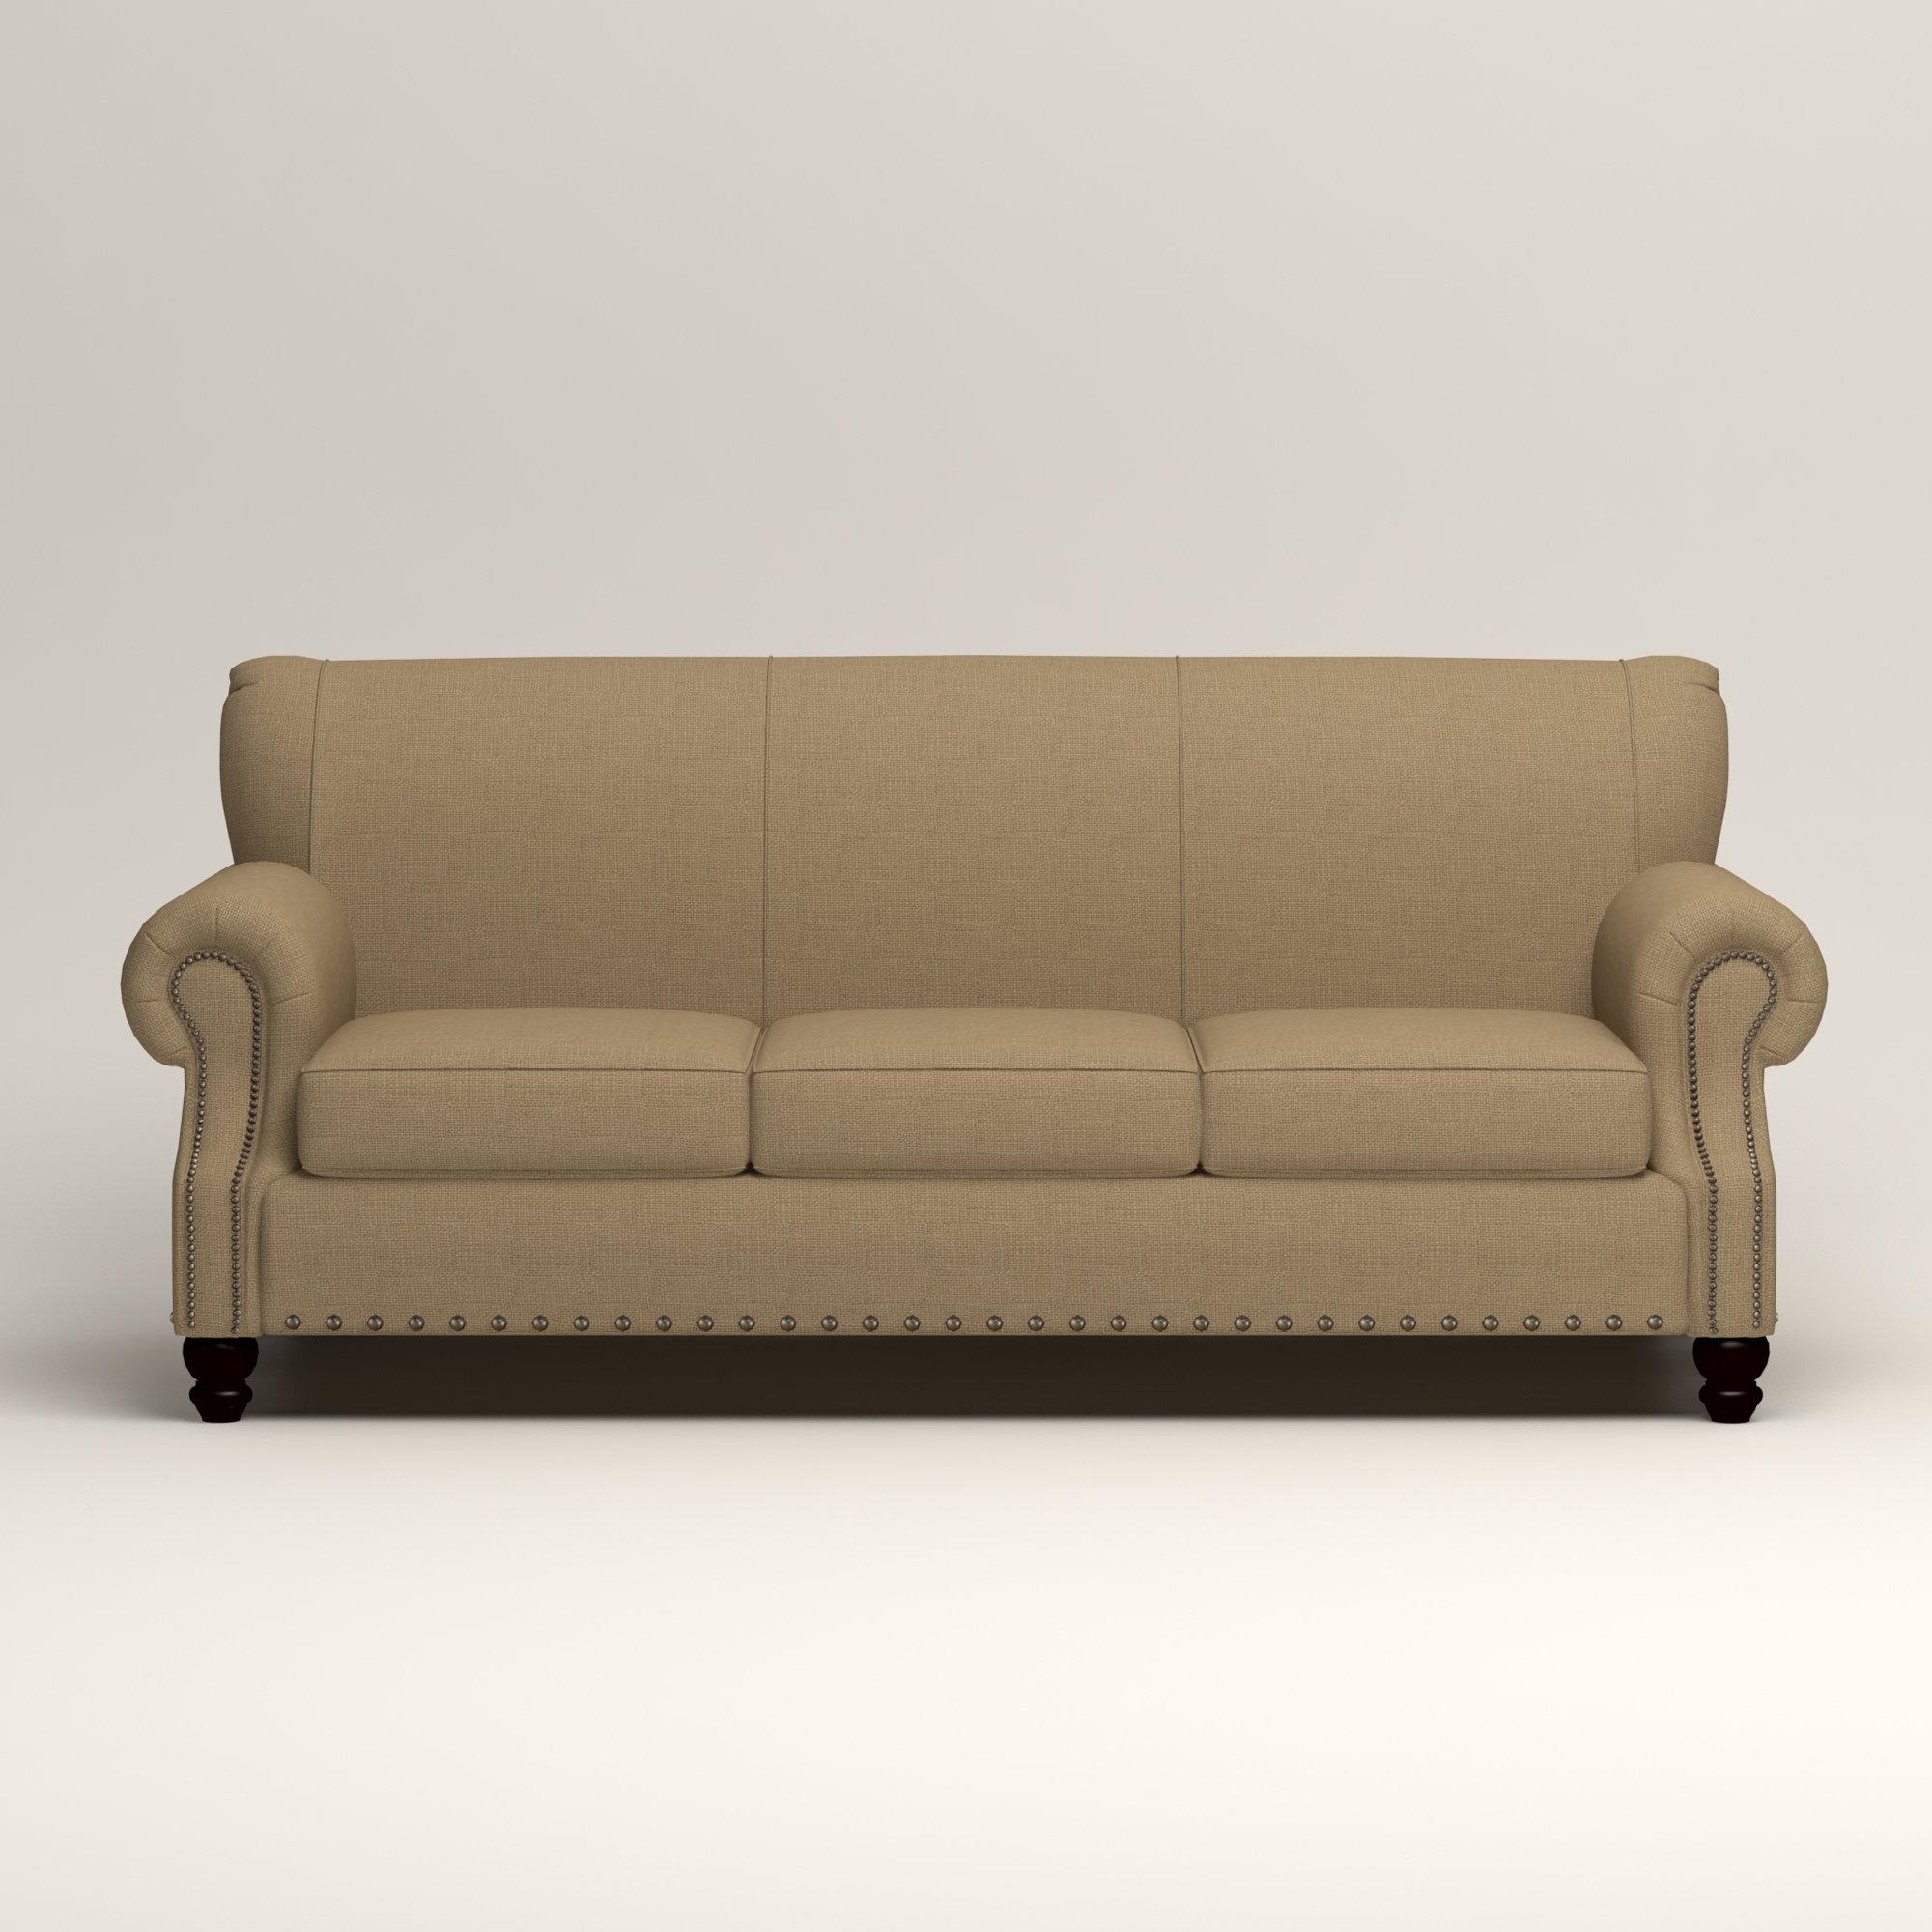 Birch Lane™ Landry Sofa & Reviews | Wayfair With Regard To Landry Sofa Chairs (View 11 of 25)